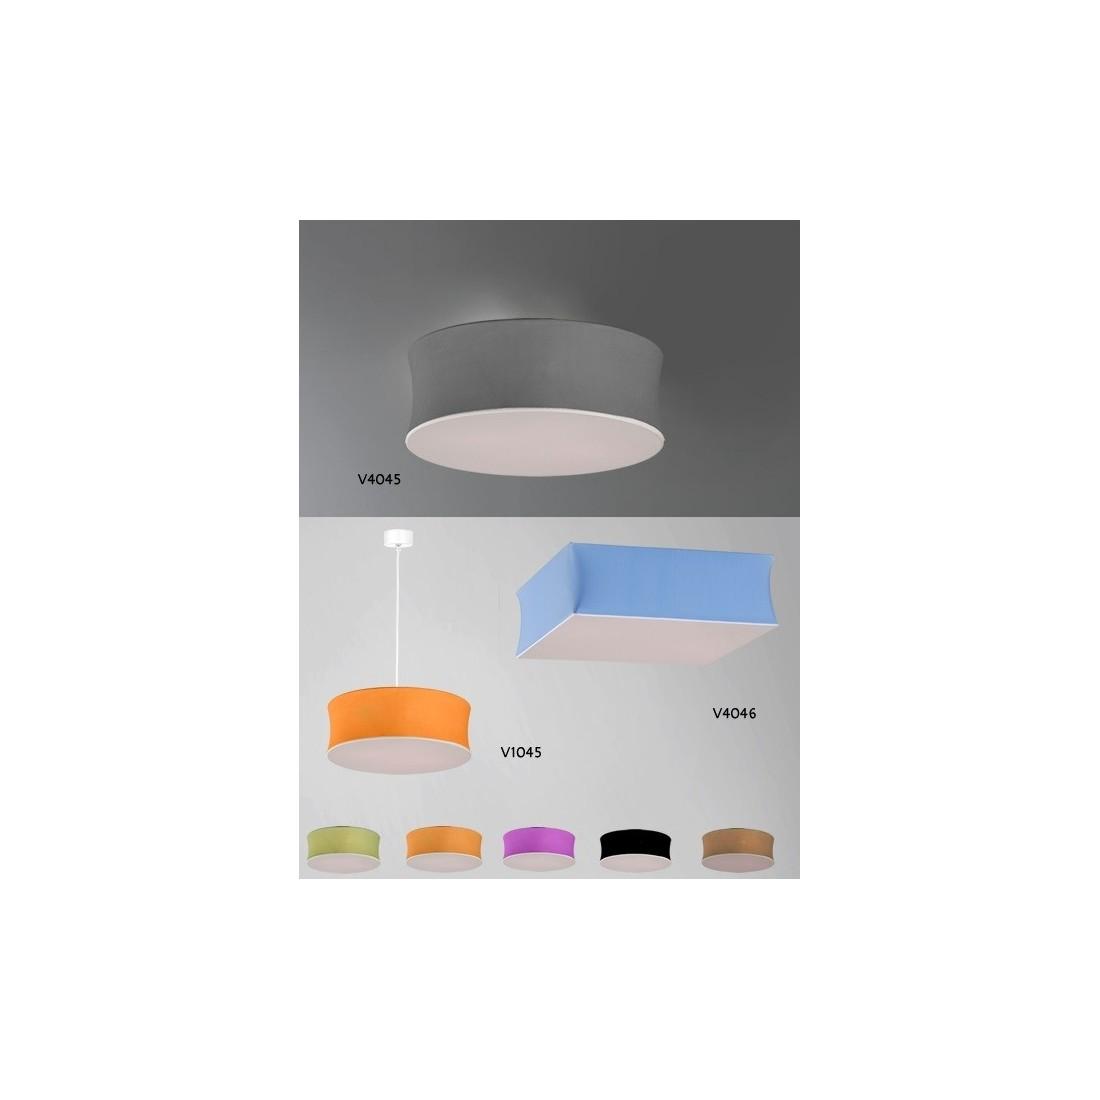 Lamparas infantiles lamparas dormitorio ni o lamparas dormitorio ni a lamparas infantiles - Ventiladores techo infantiles ...